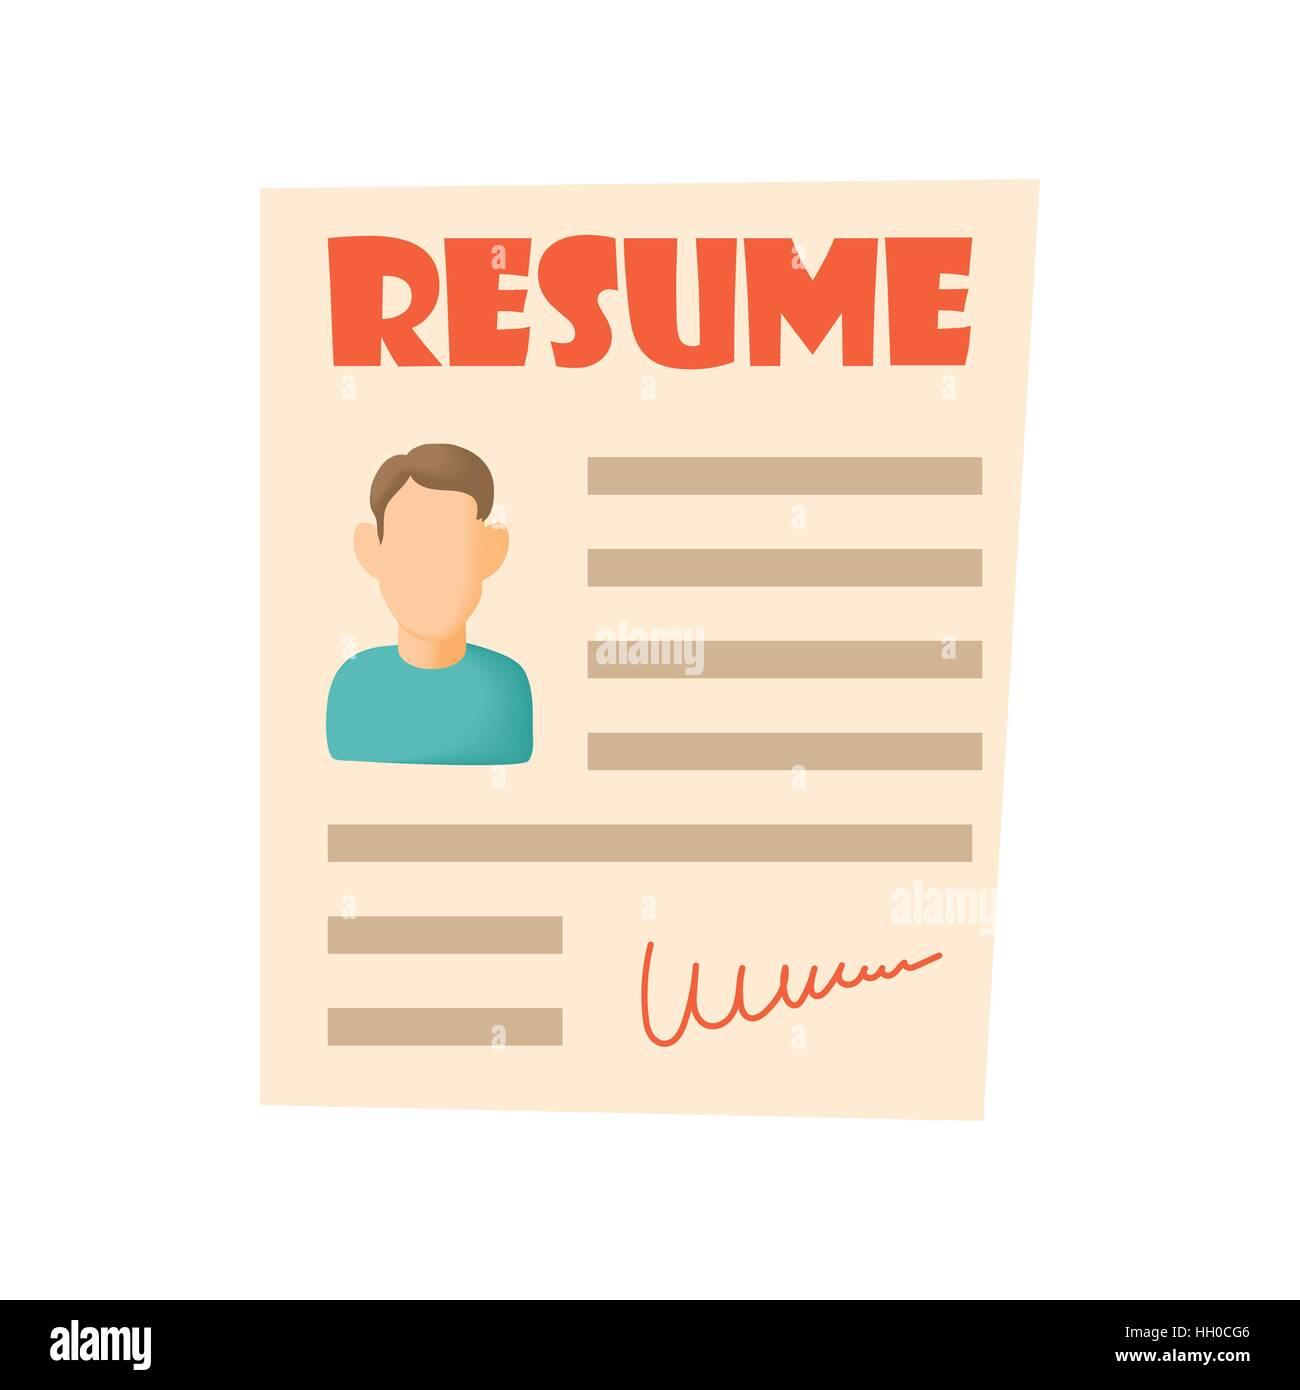 resume icon cartoon style